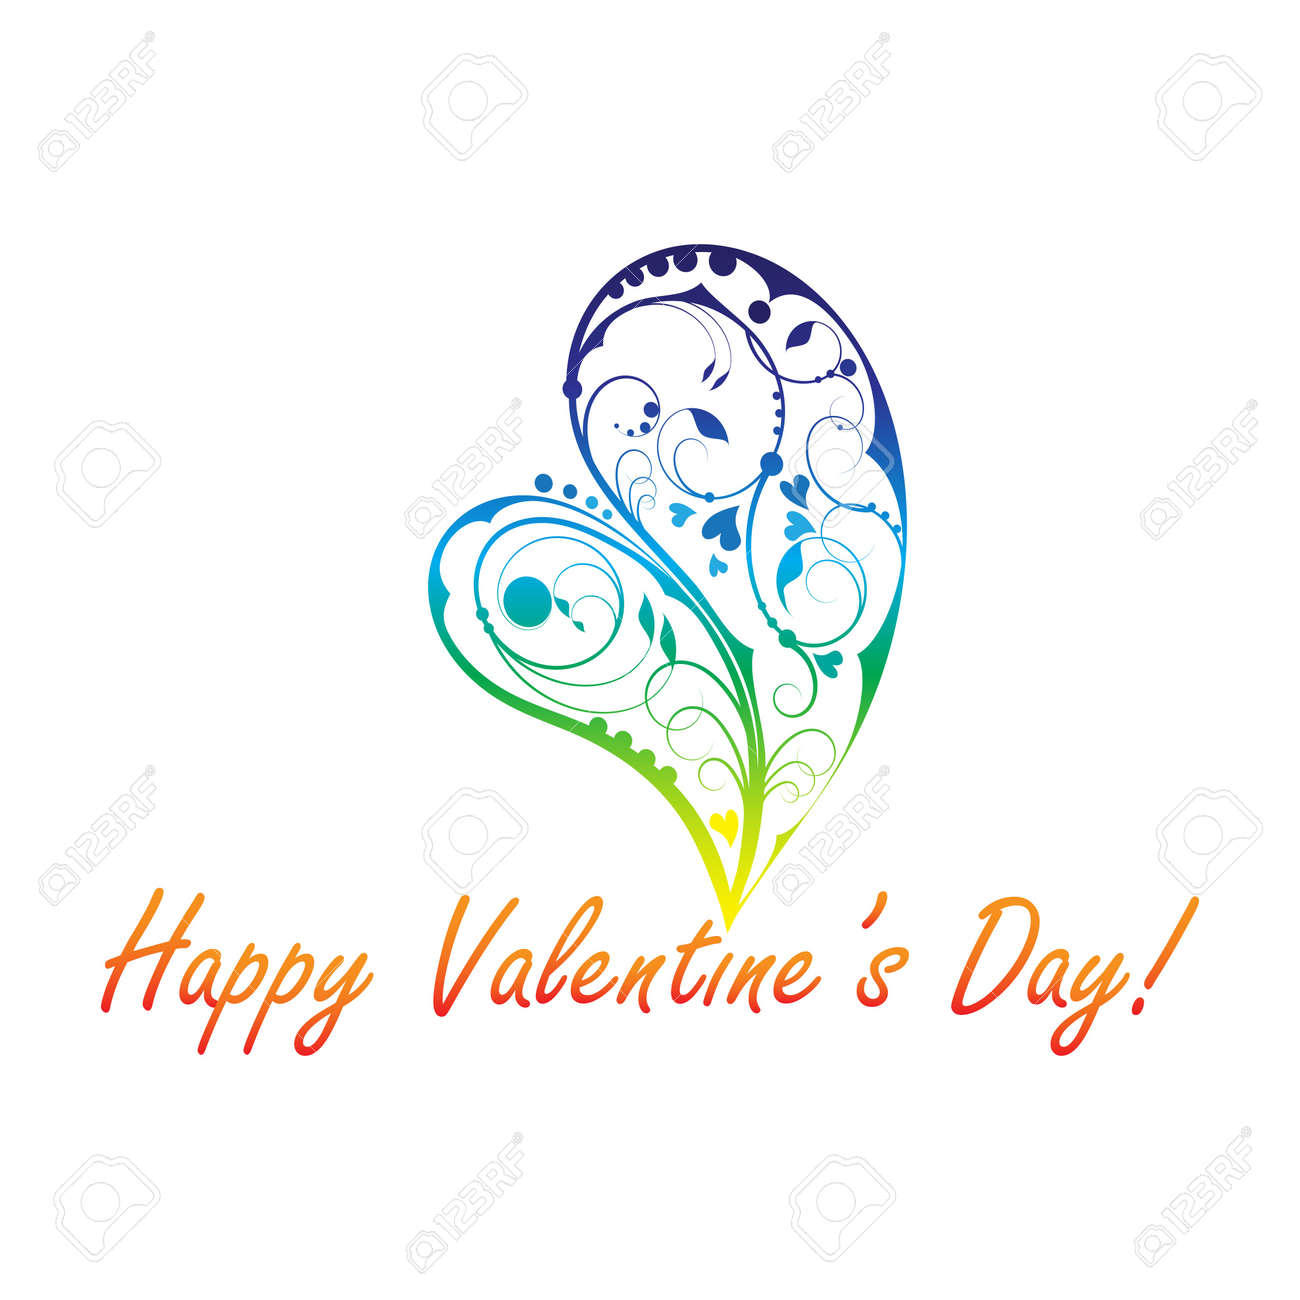 Beautiful valentine's day design Stock Vector - 17565487